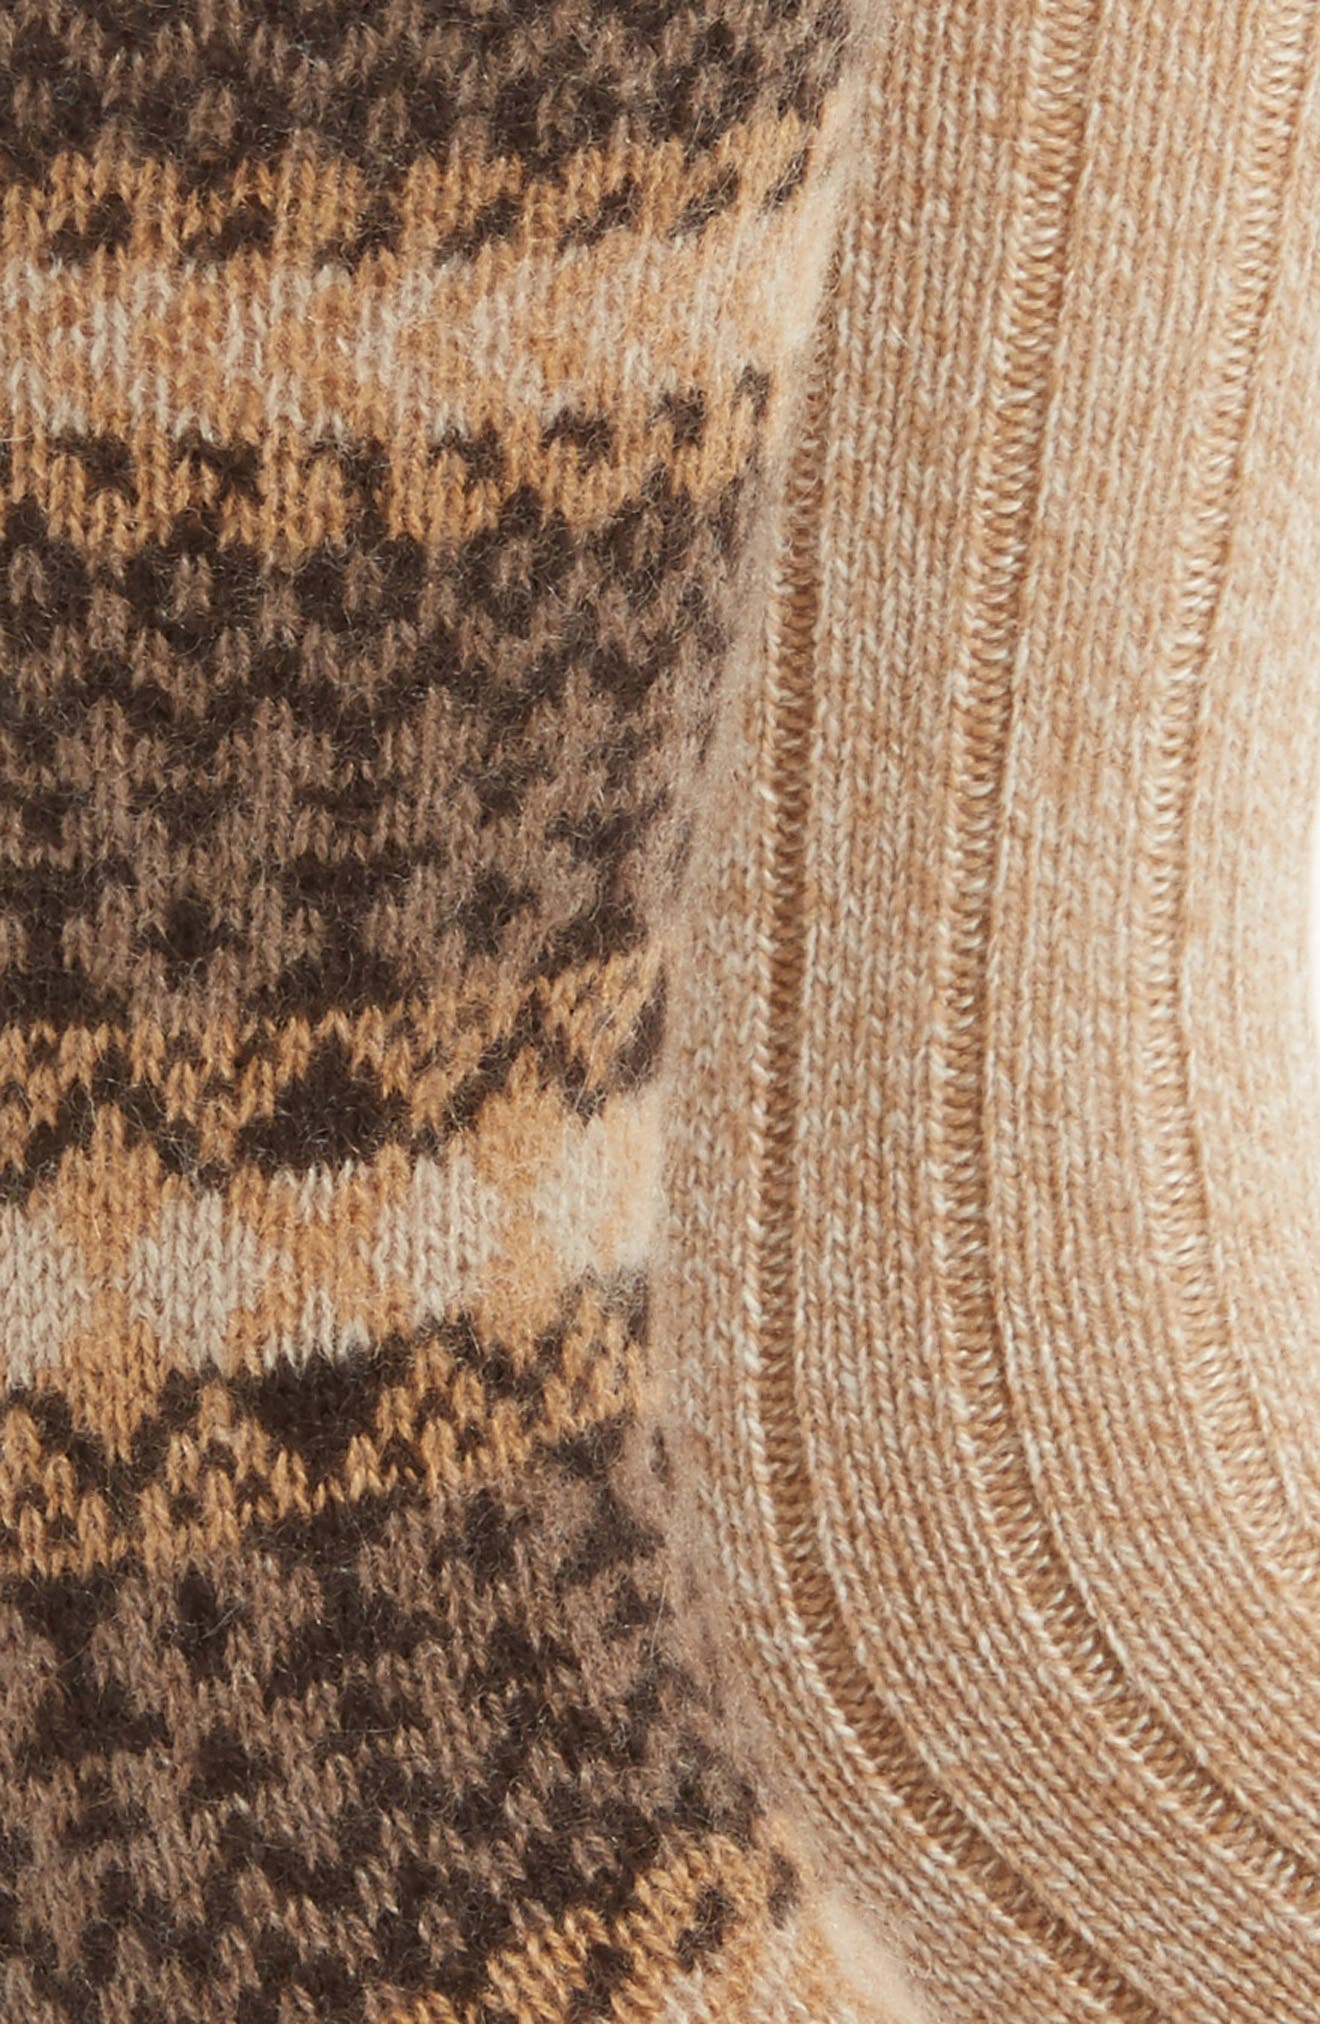 2-Pack Cashmere Blend Socks,                             Alternate thumbnail 8, color,